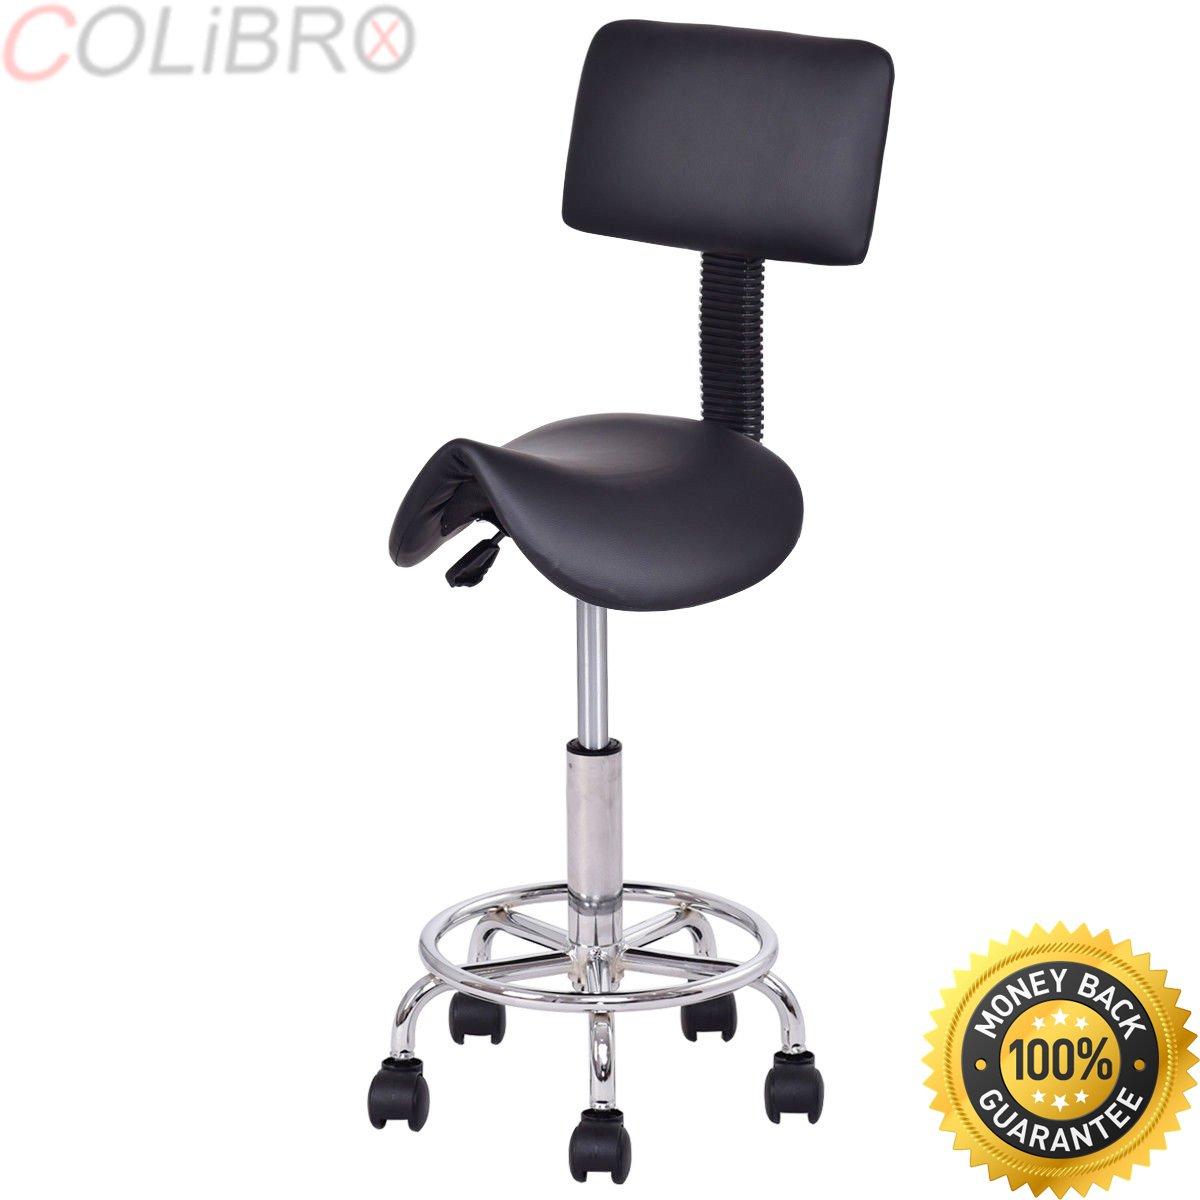 COLIBROX--Adjustable Saddle Salon Stool Rolling Massage Chair Tattoo Facial Spa w/Backrest. cutting stool for hairdressers.best salon stool chair amazon.salon stool for sale.best massage salon chair.